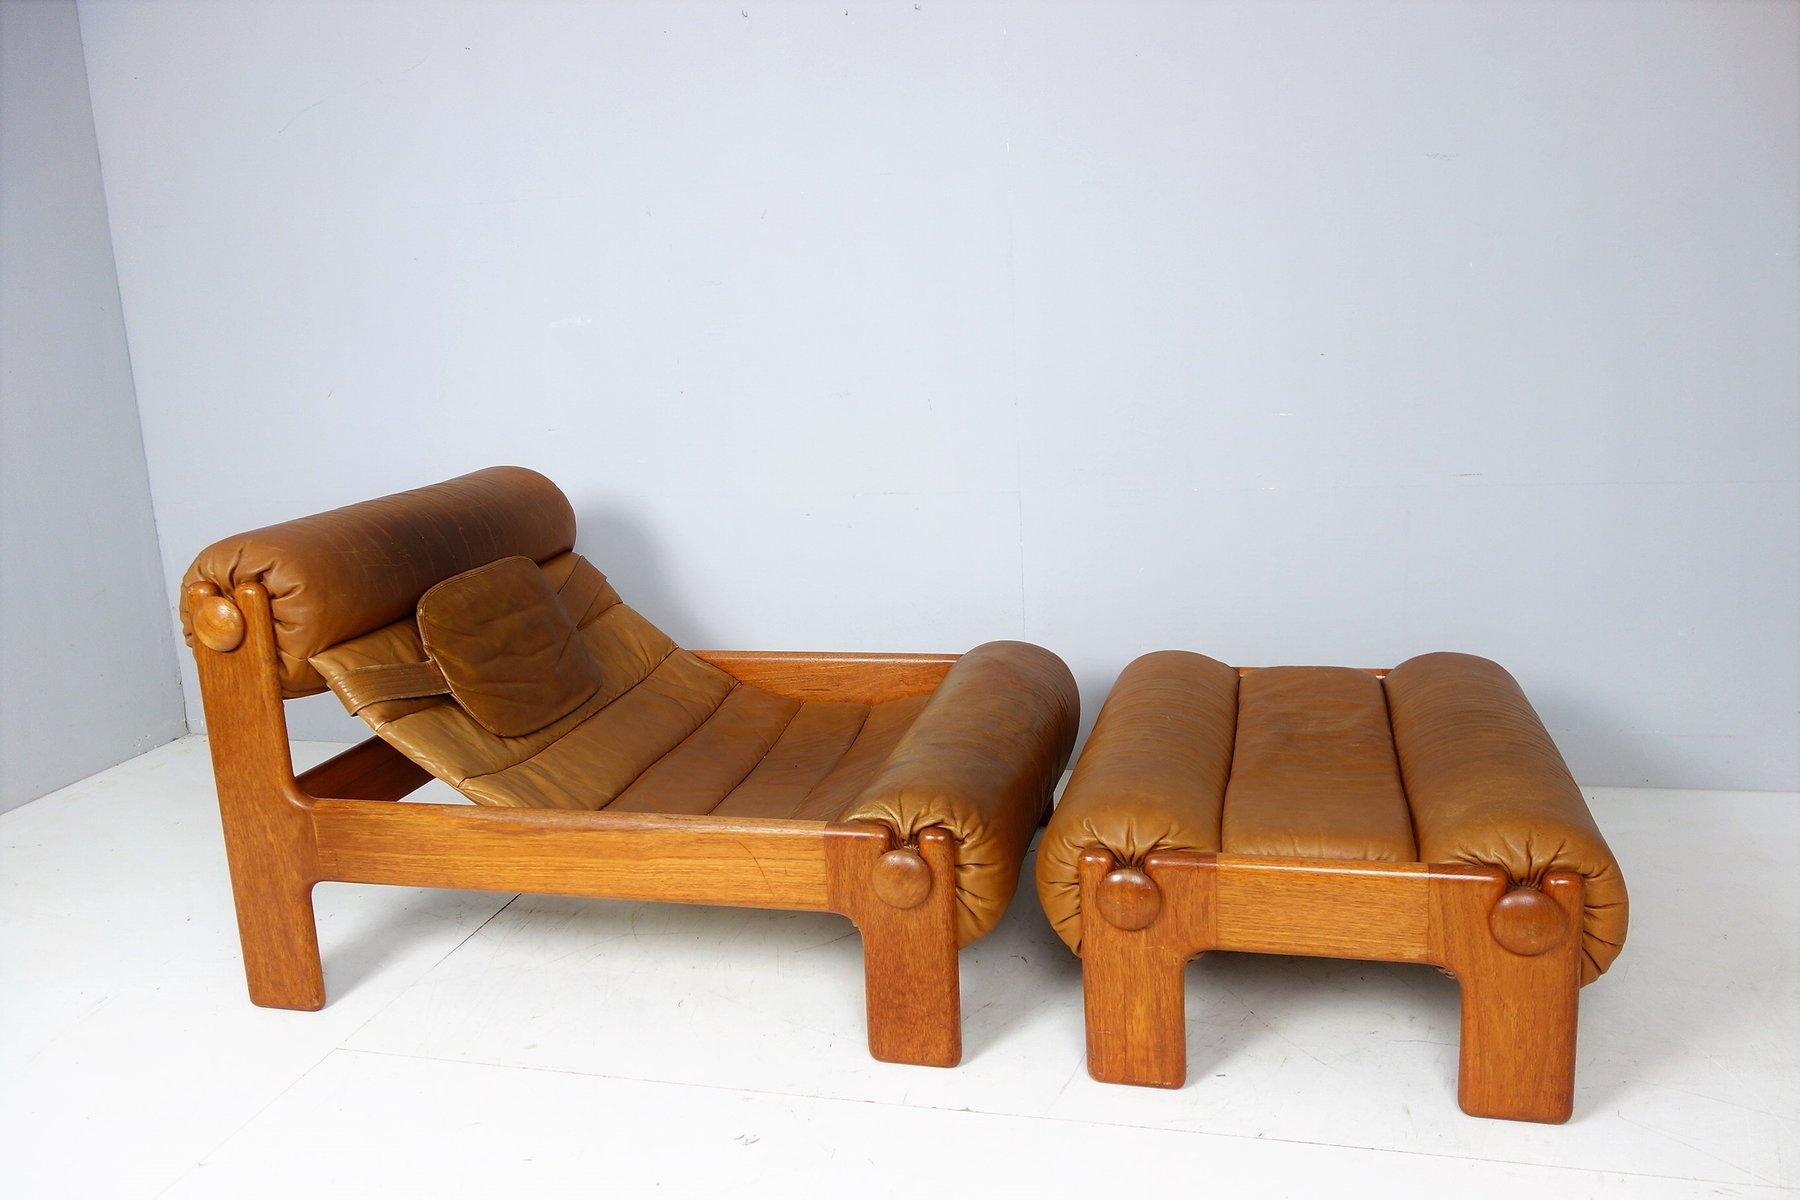 Captivating Vintage Swedish Lounge Chair U0026 Ottoman, 1960s